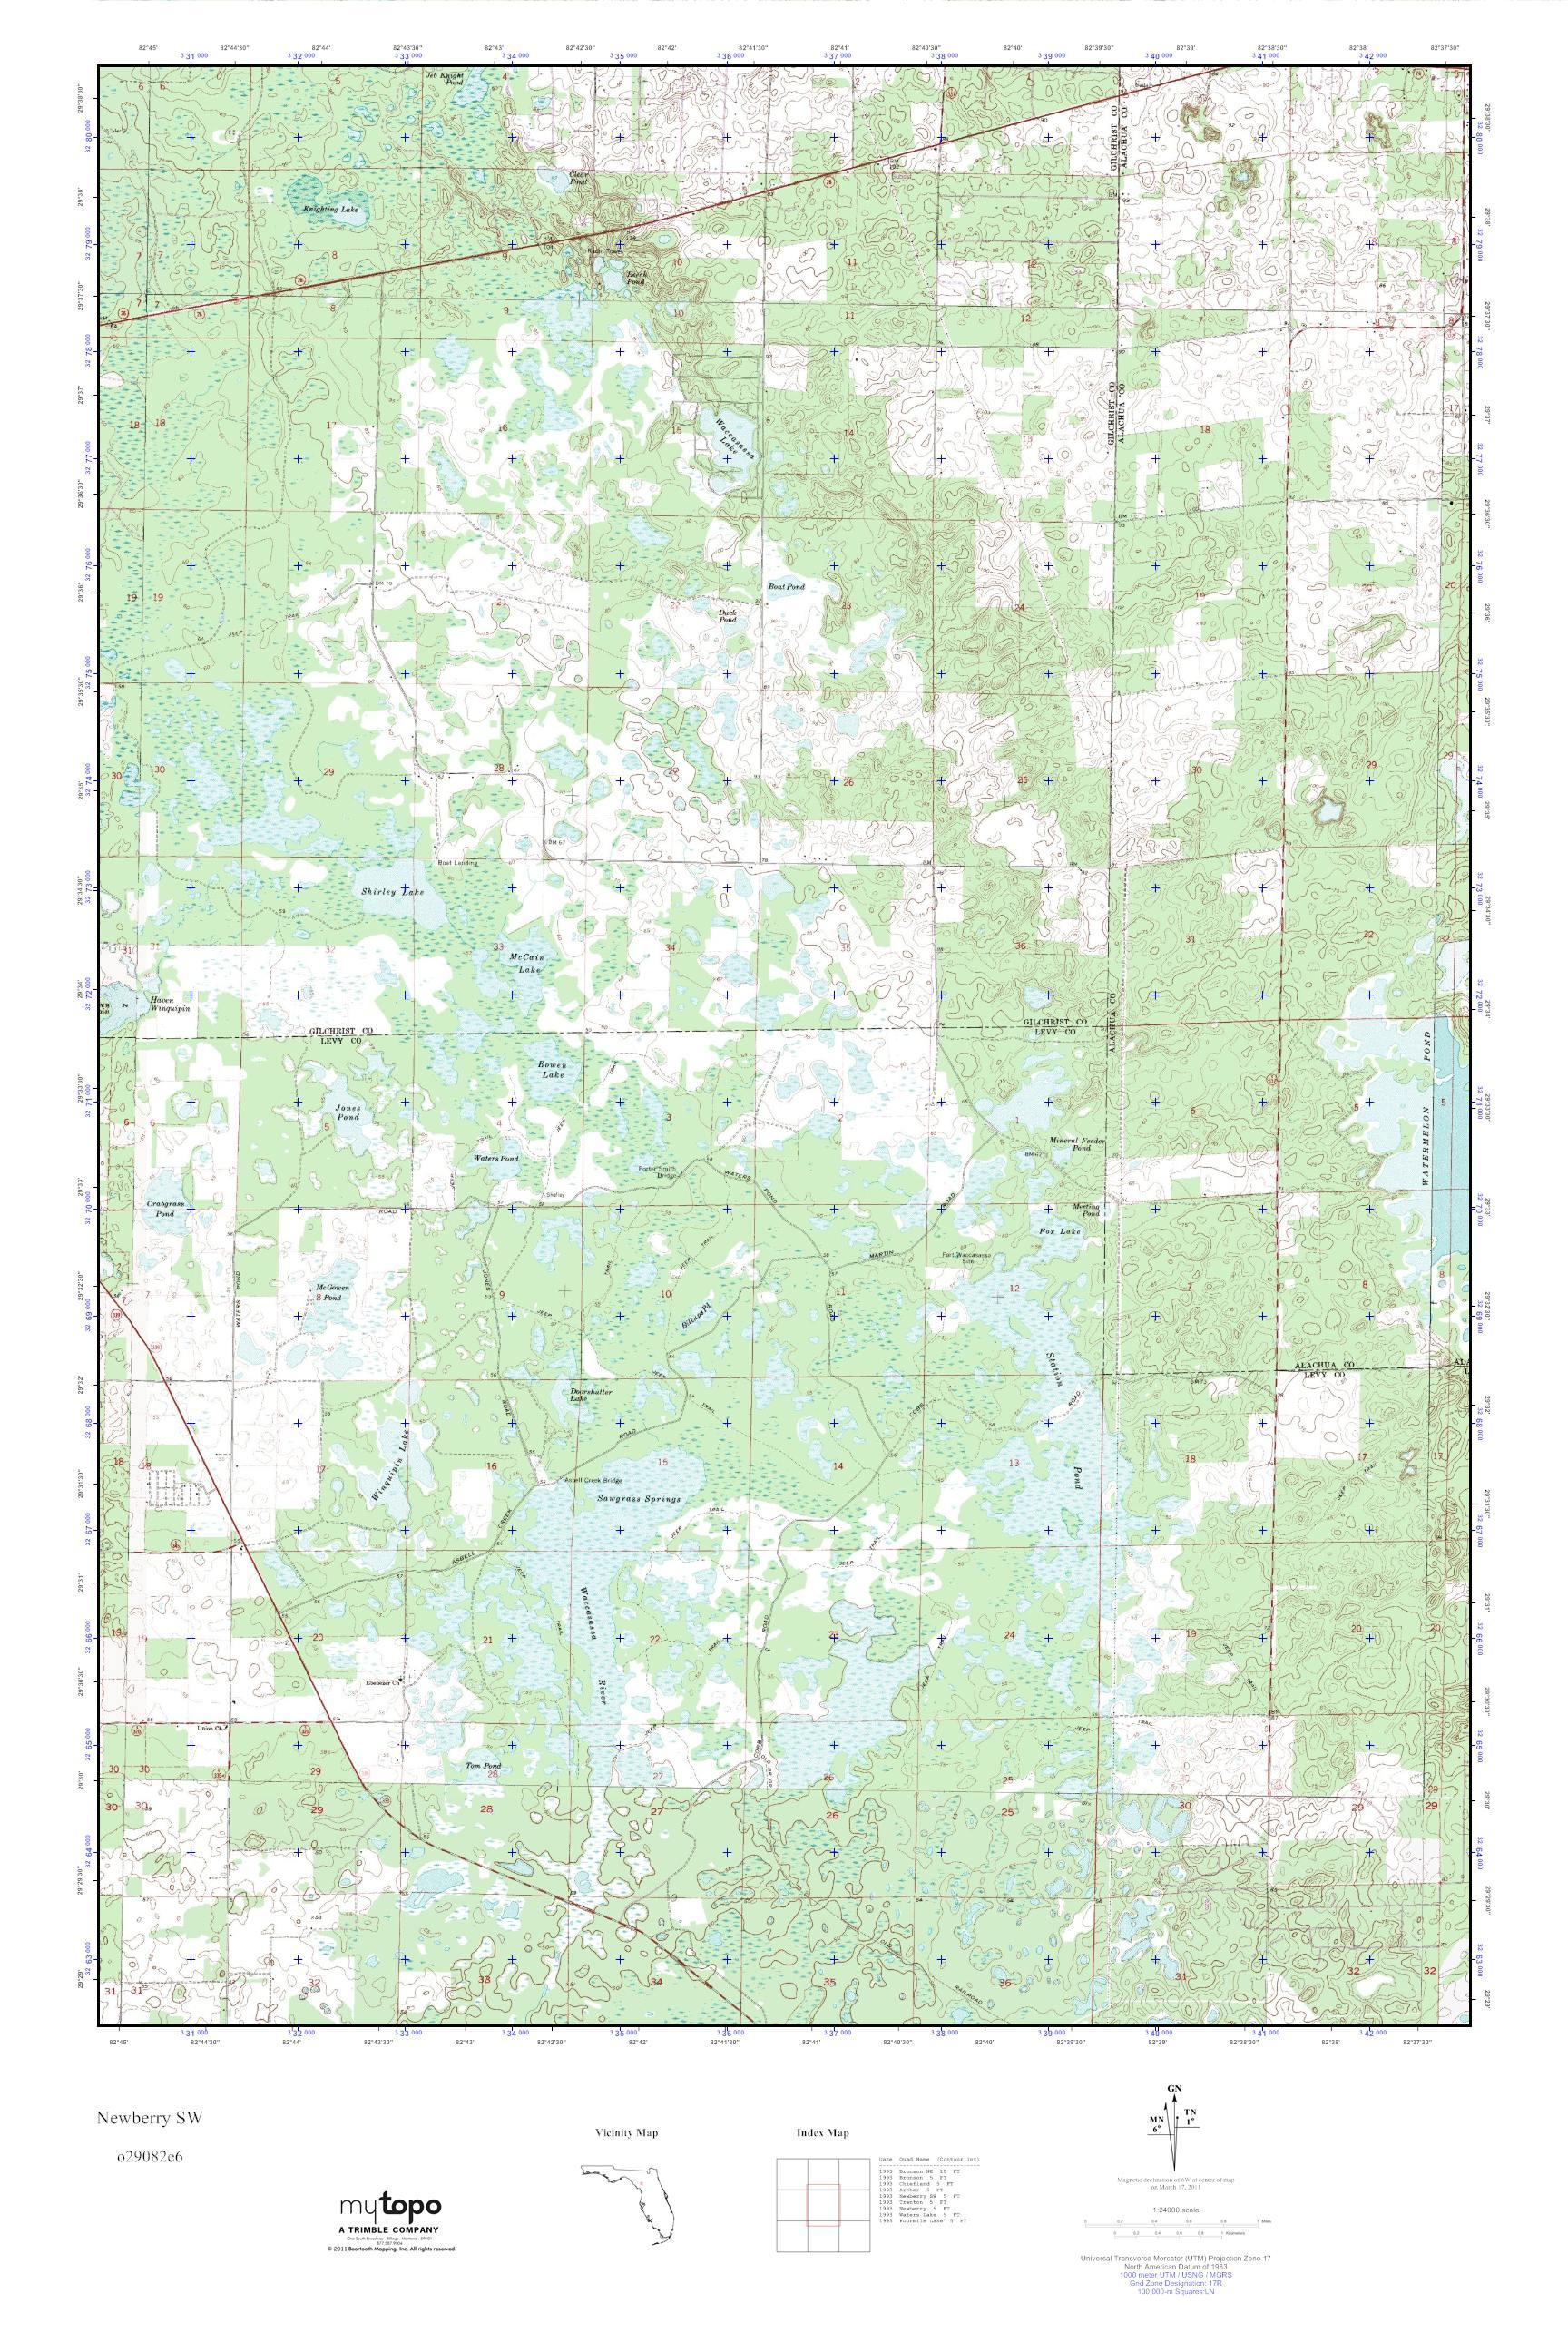 Mytopo Newberry Sw, Florida Usgs Quad Topo Map - Newberry Florida Map